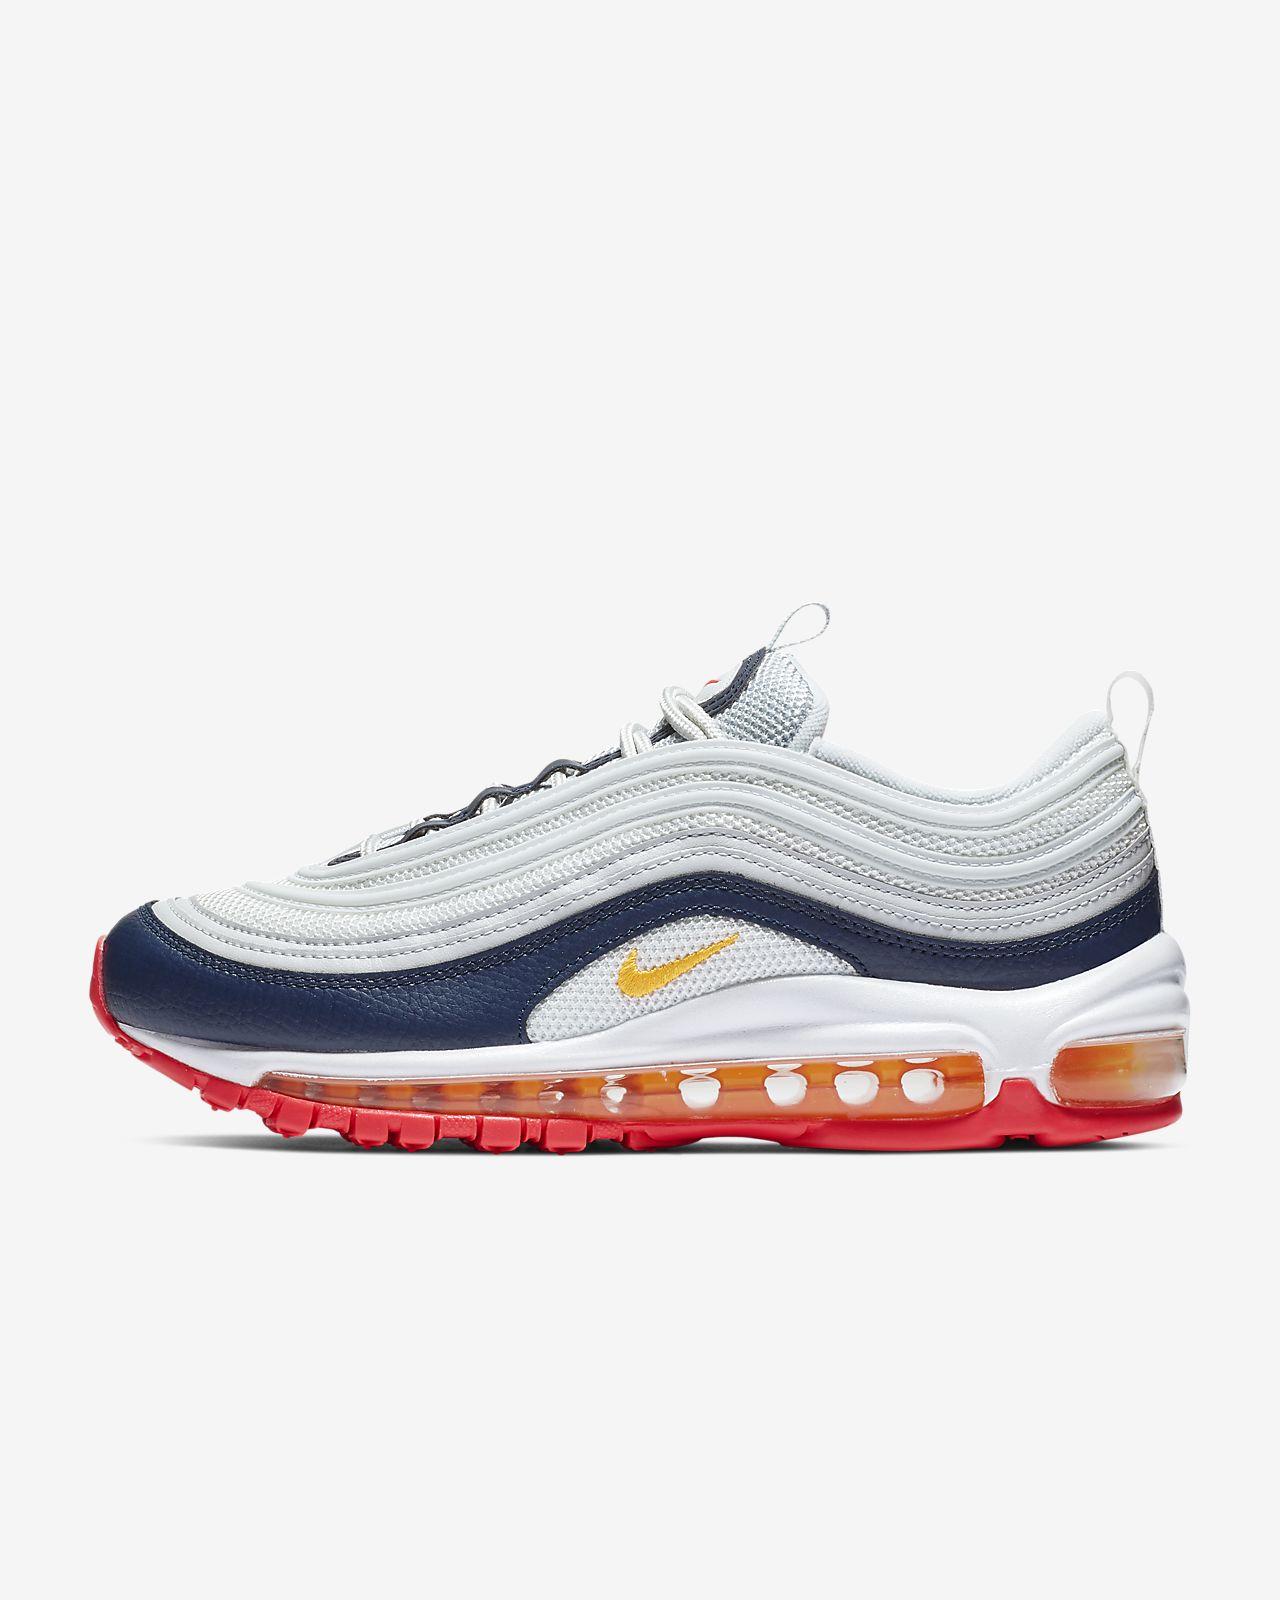 Nike Air Max 97 Premium Women's Shoe